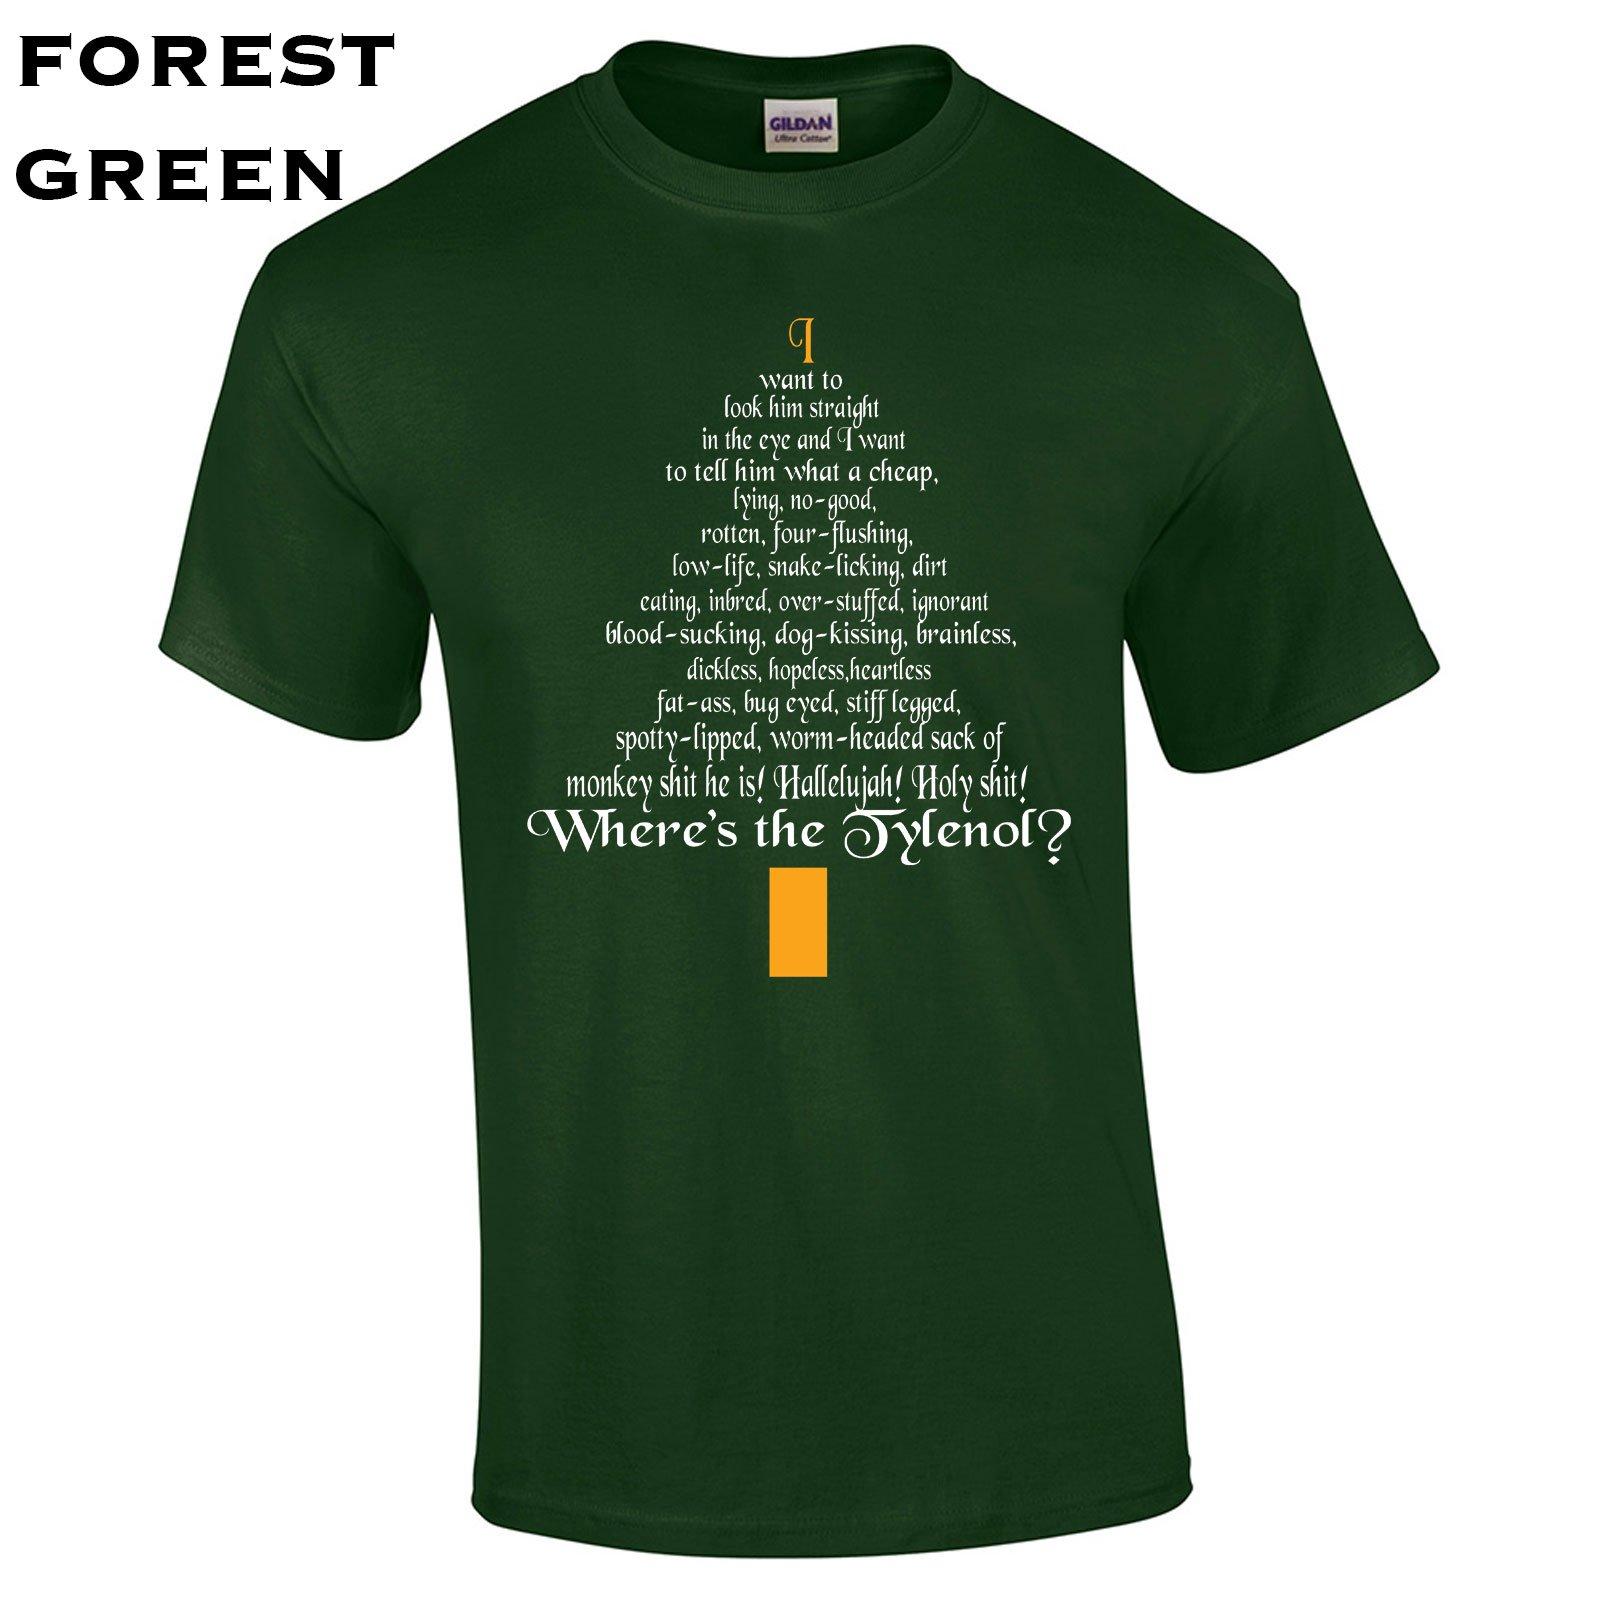 398 Clark Rant Funny Christmas Mens T Shirt